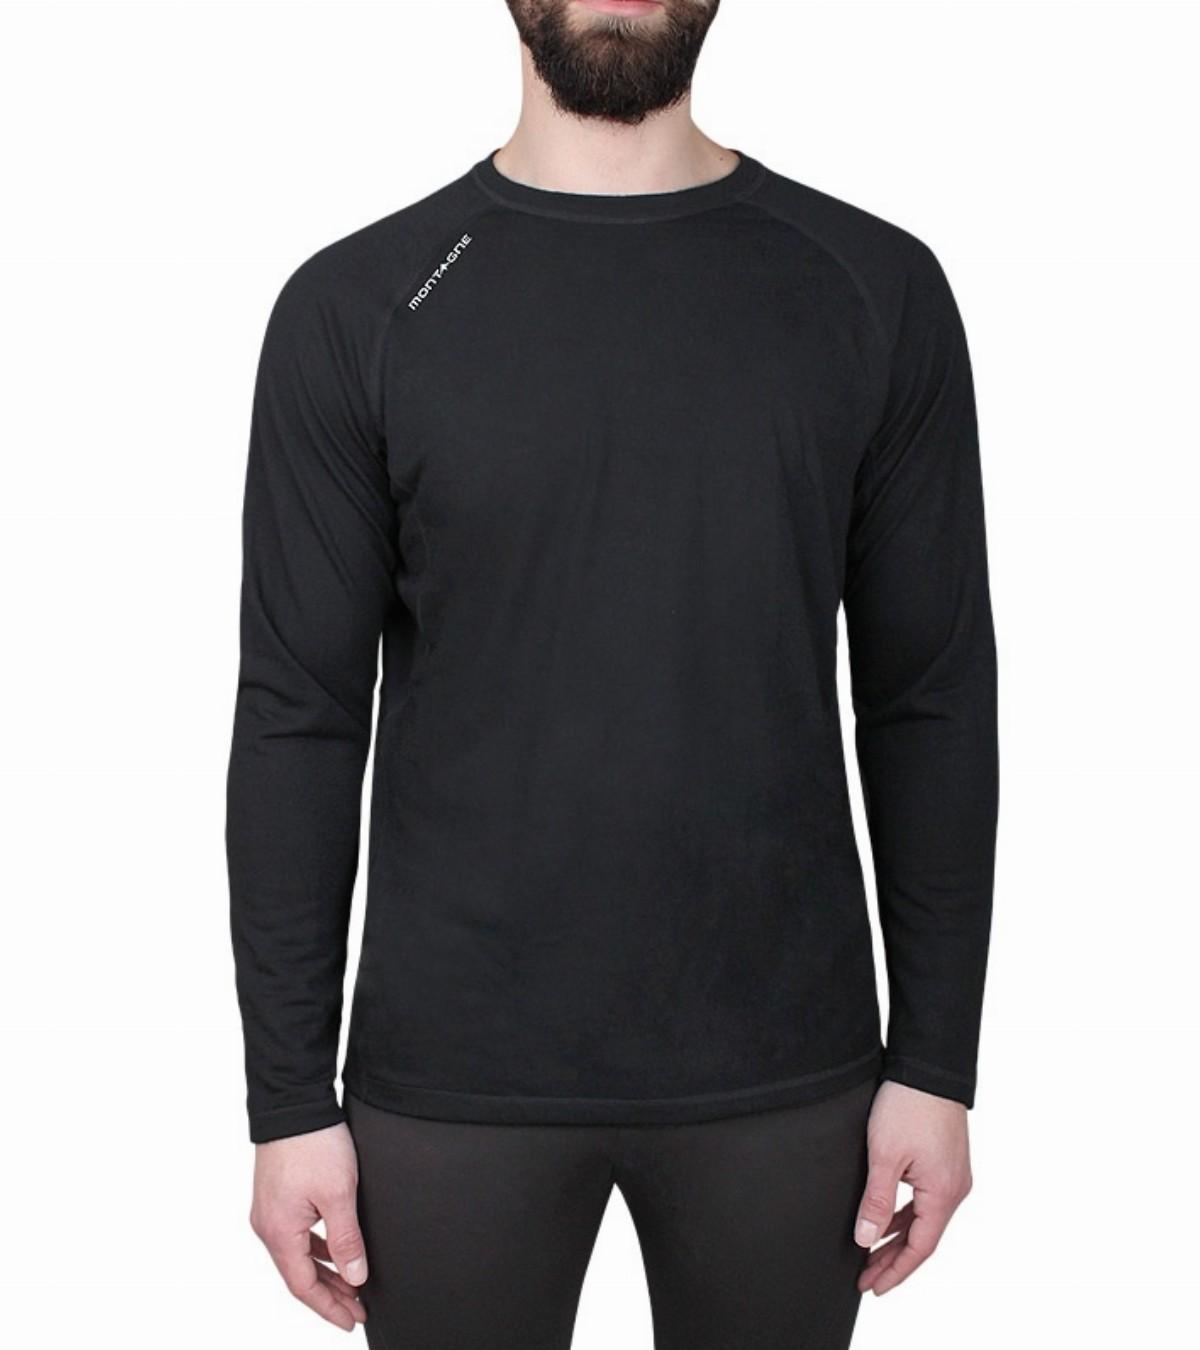 nuevo estilo 82973 504d5 Camiseta térmica de hombre Chuck